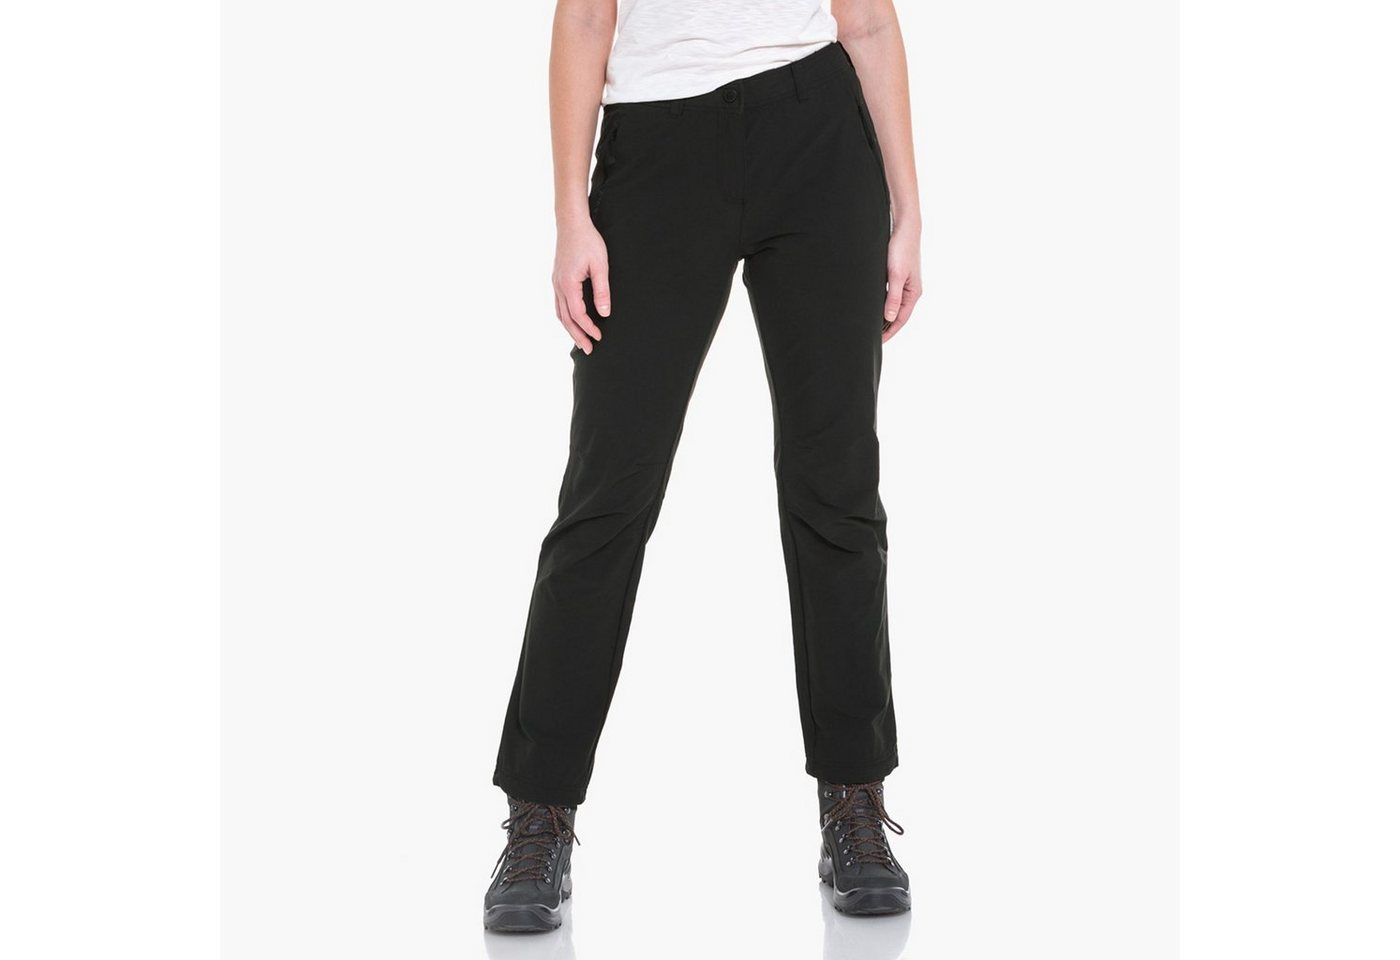 Schöffel Outdoorhose »Pants Engadin«   Bekleidung > Hosen > Outdoorhosen   Schwarz   Nylon   Schöffel